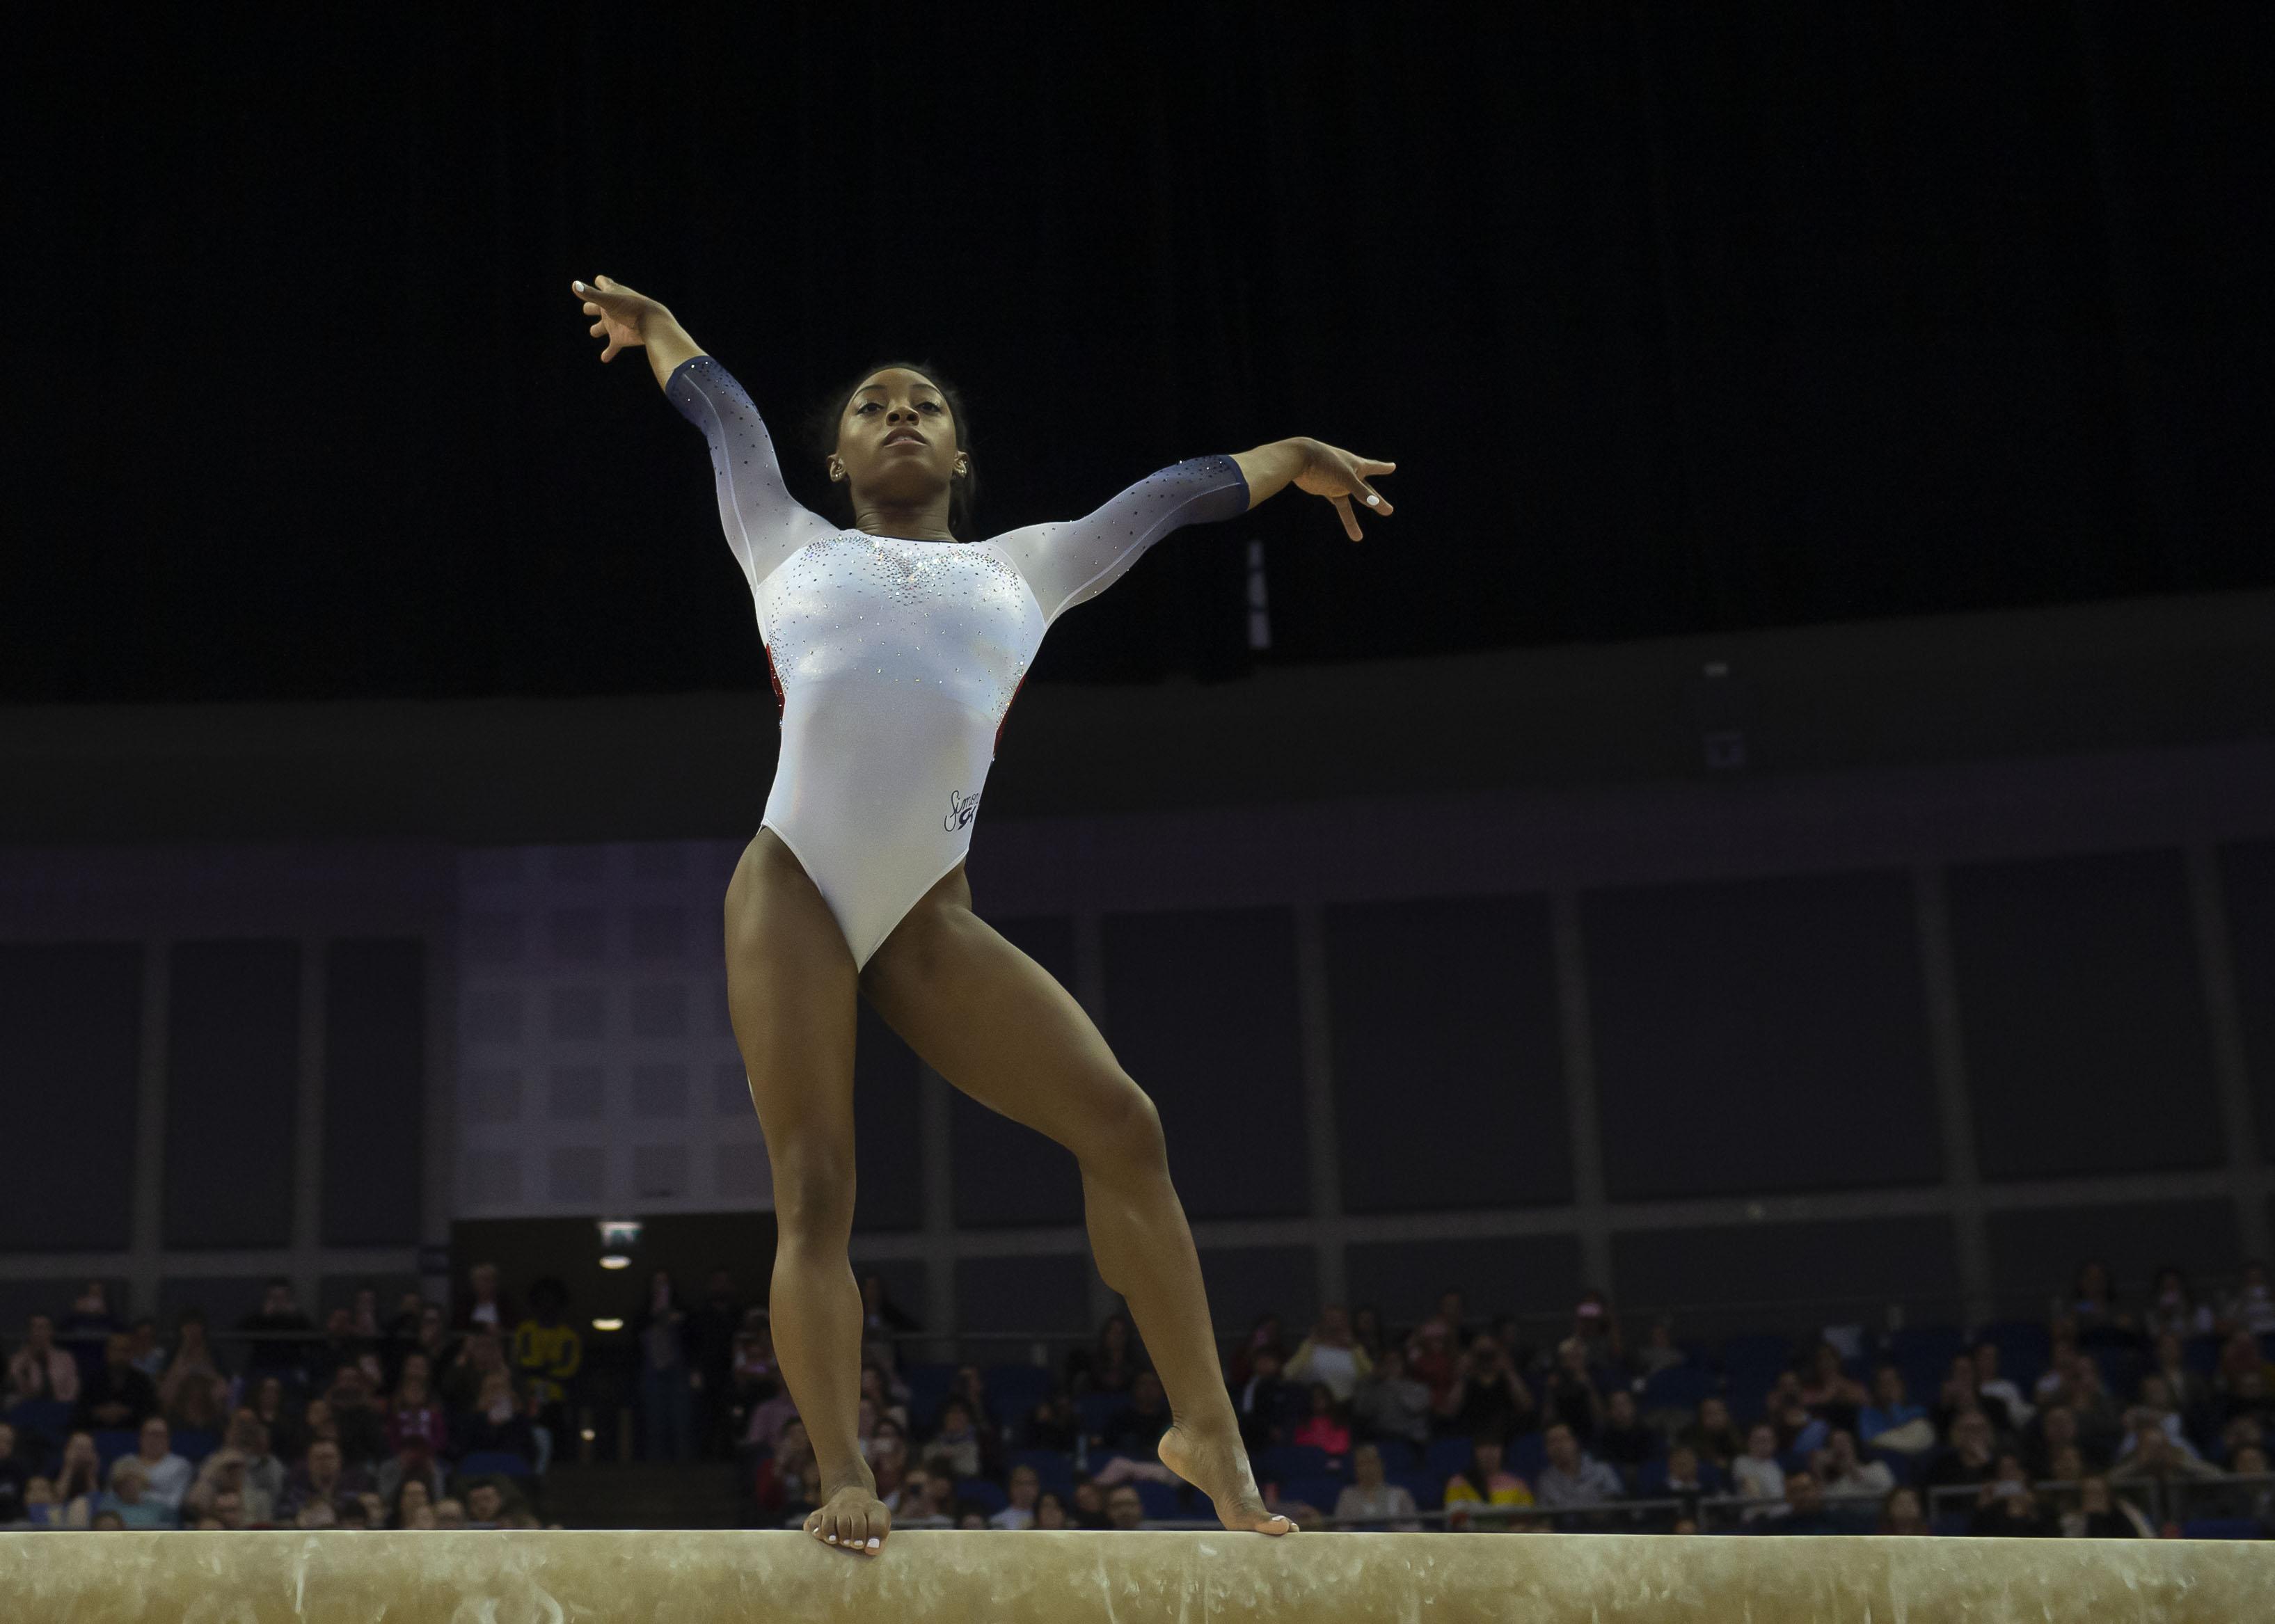 Superstars Of Gymnastics in London